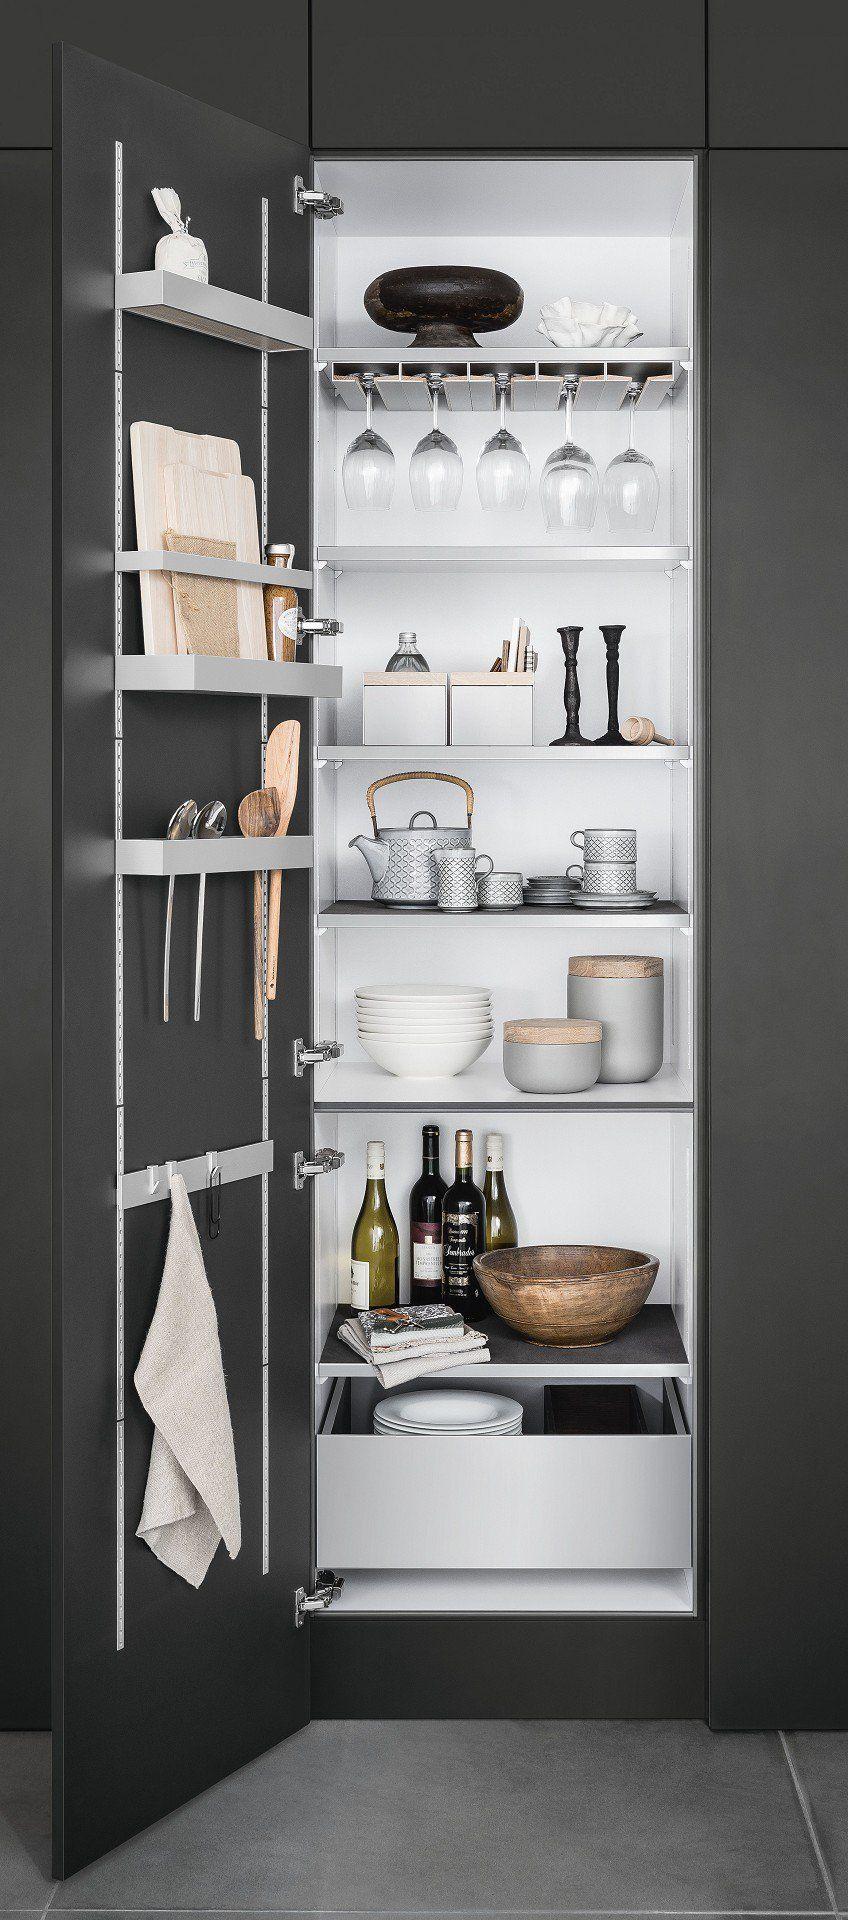 siematic multimatic interior accessories for kitchen aluminum kitchen cabinets kitchen models on kitchen interior accessories id=19783